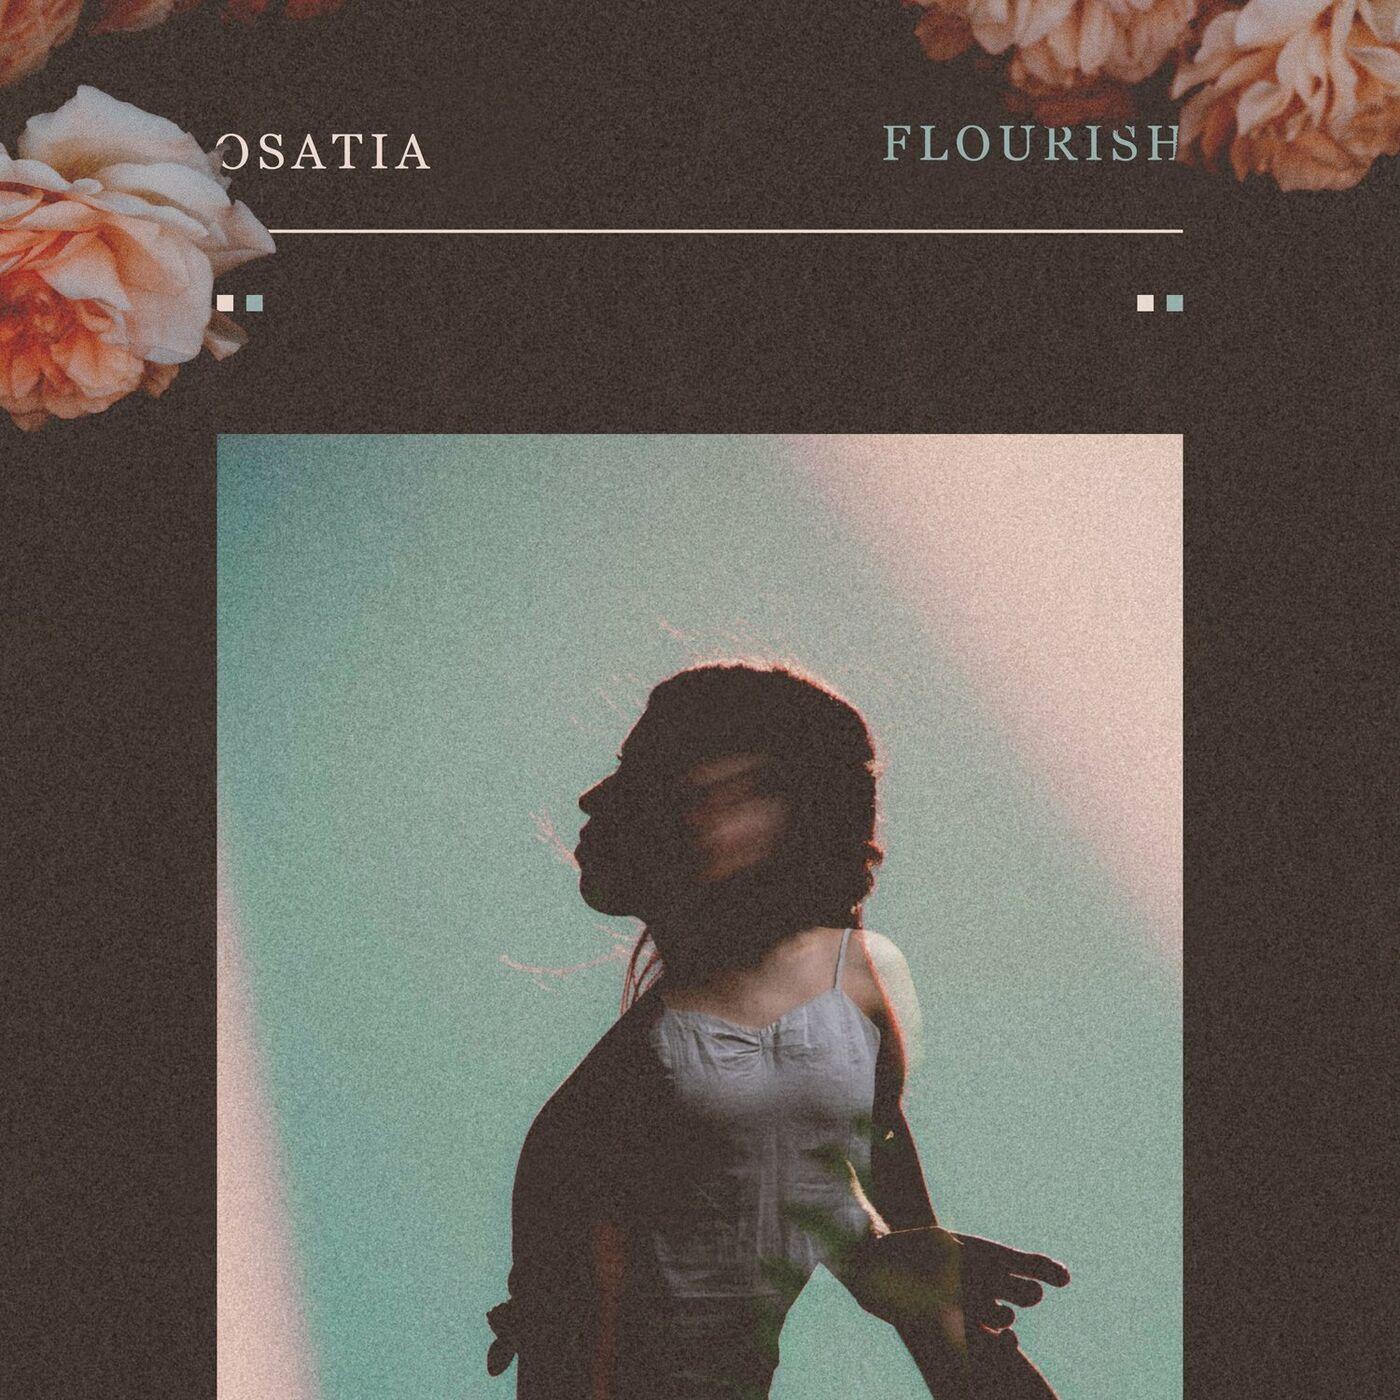 Osatia - Flourish [single] (2019)